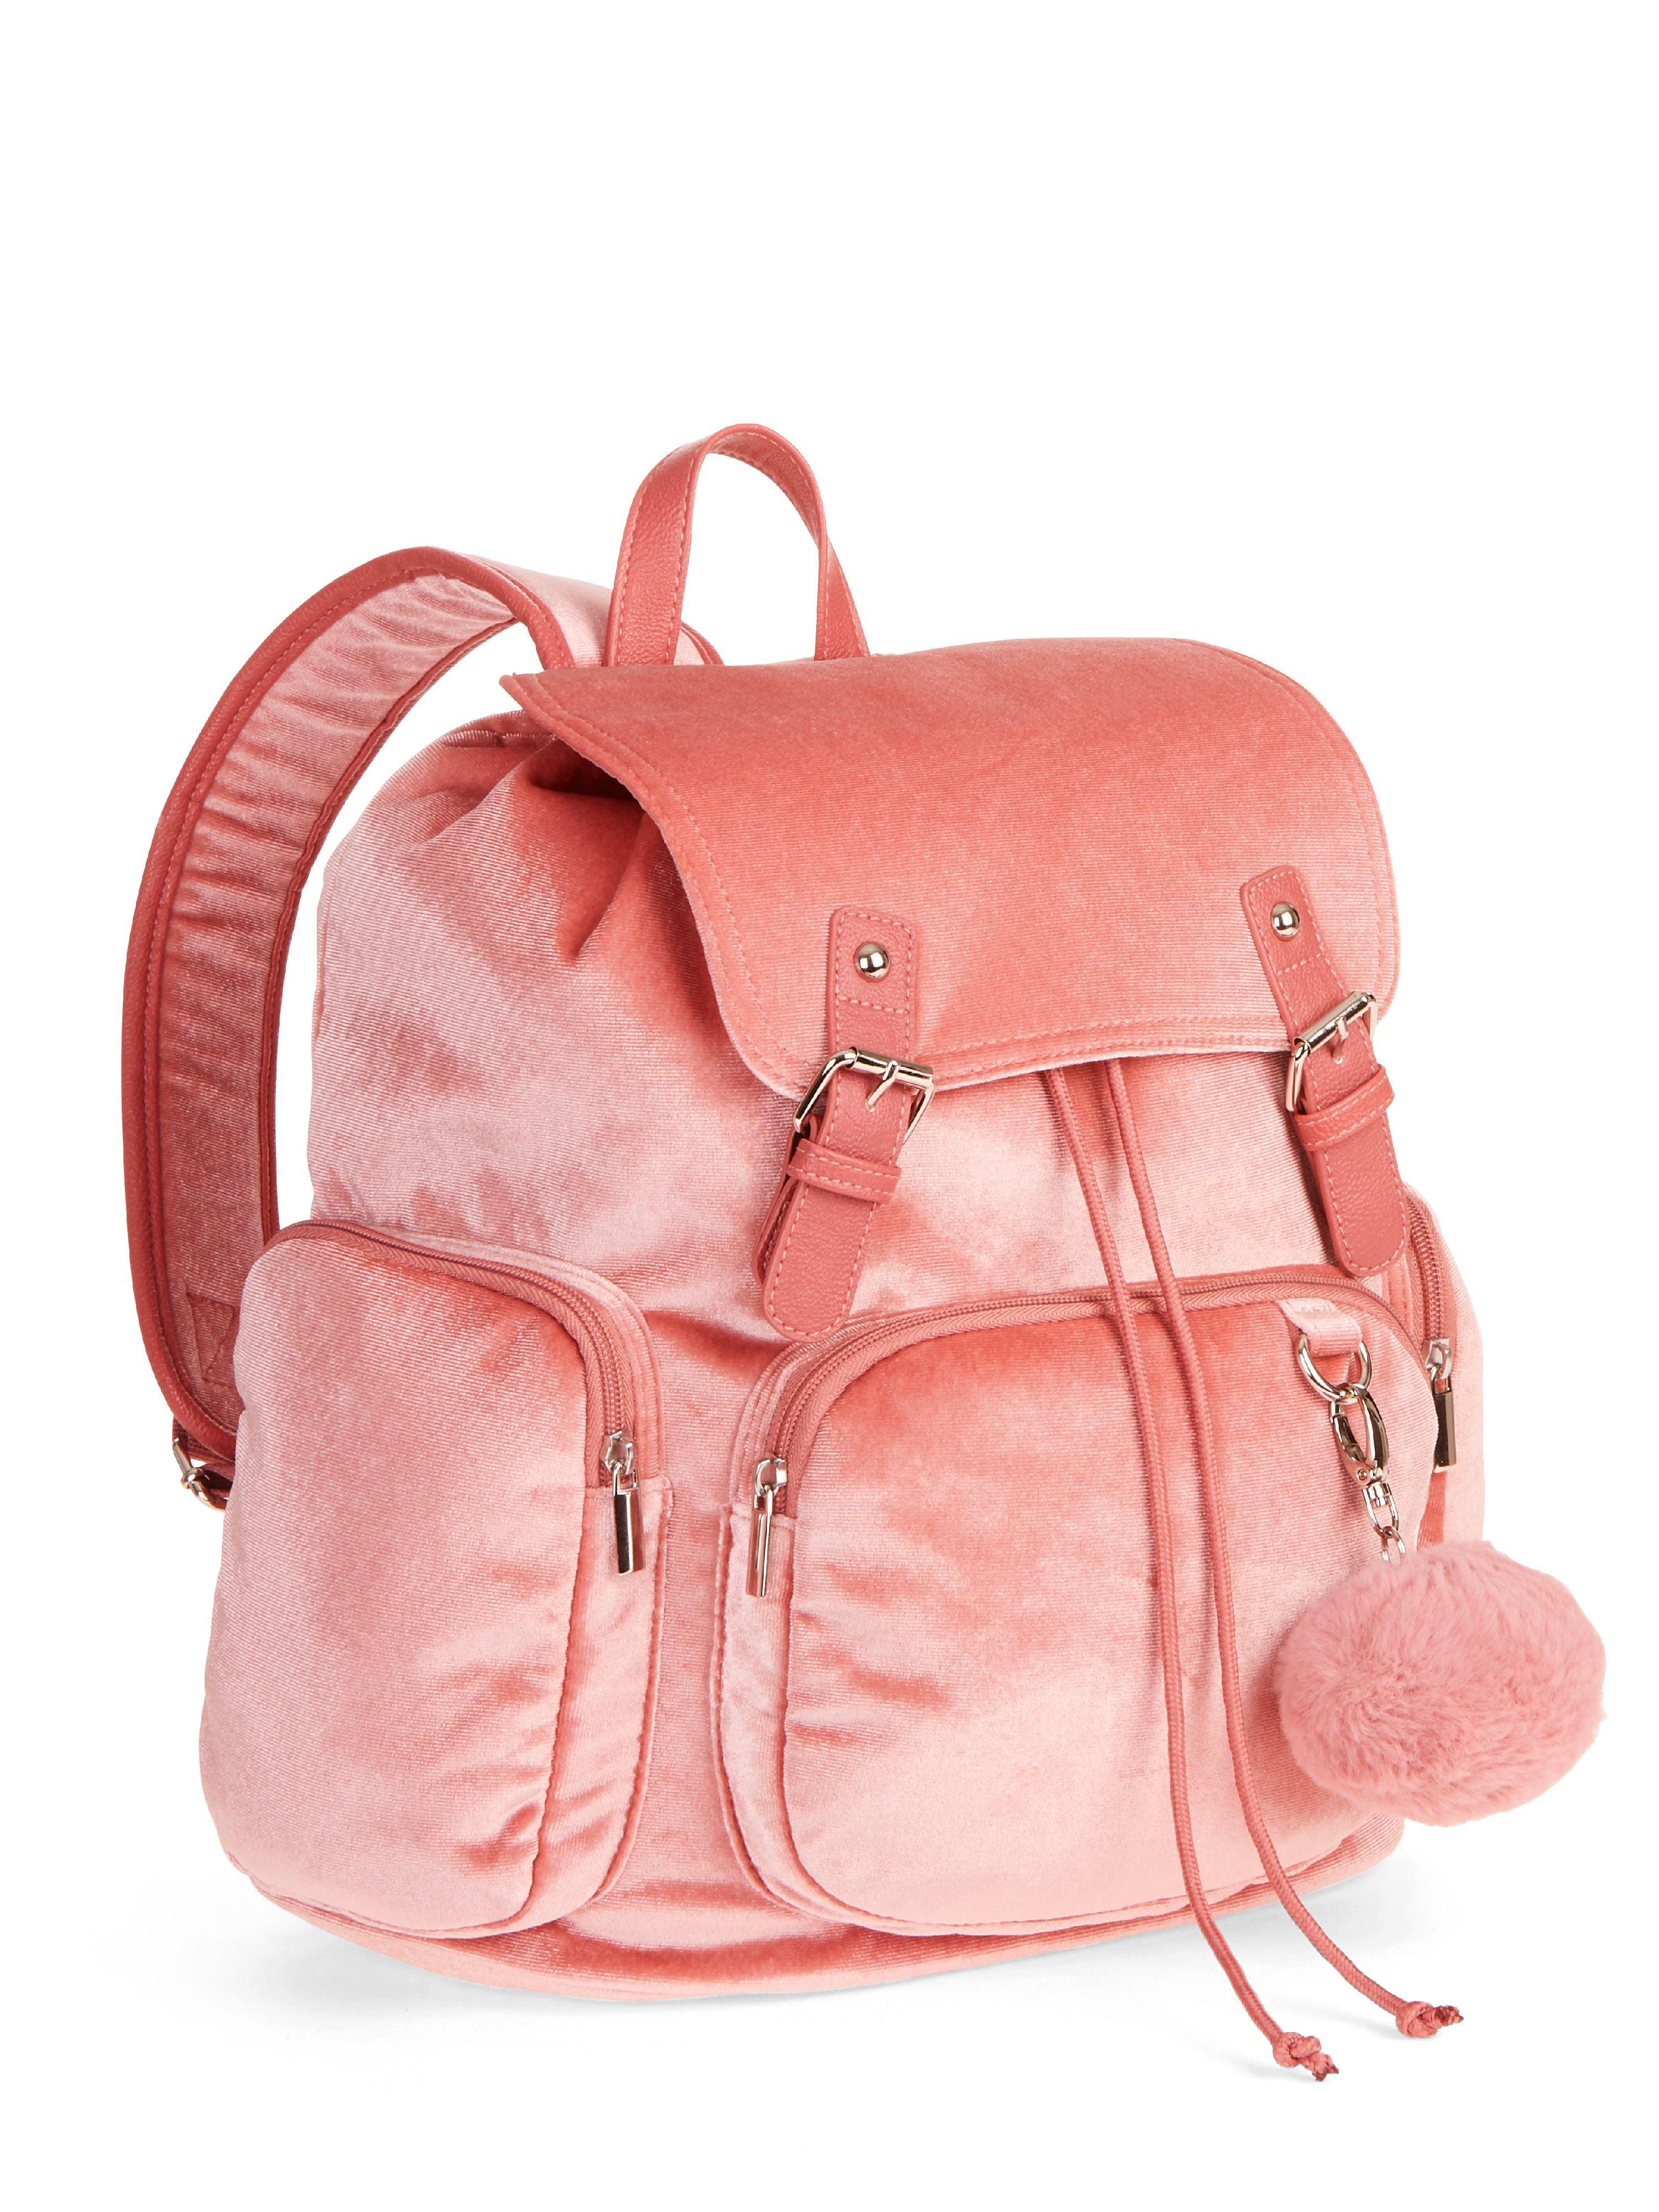 b7c7872e5d4b No Boundaries Blush Velvet Cargo Backpack – Walmart Inventory ...